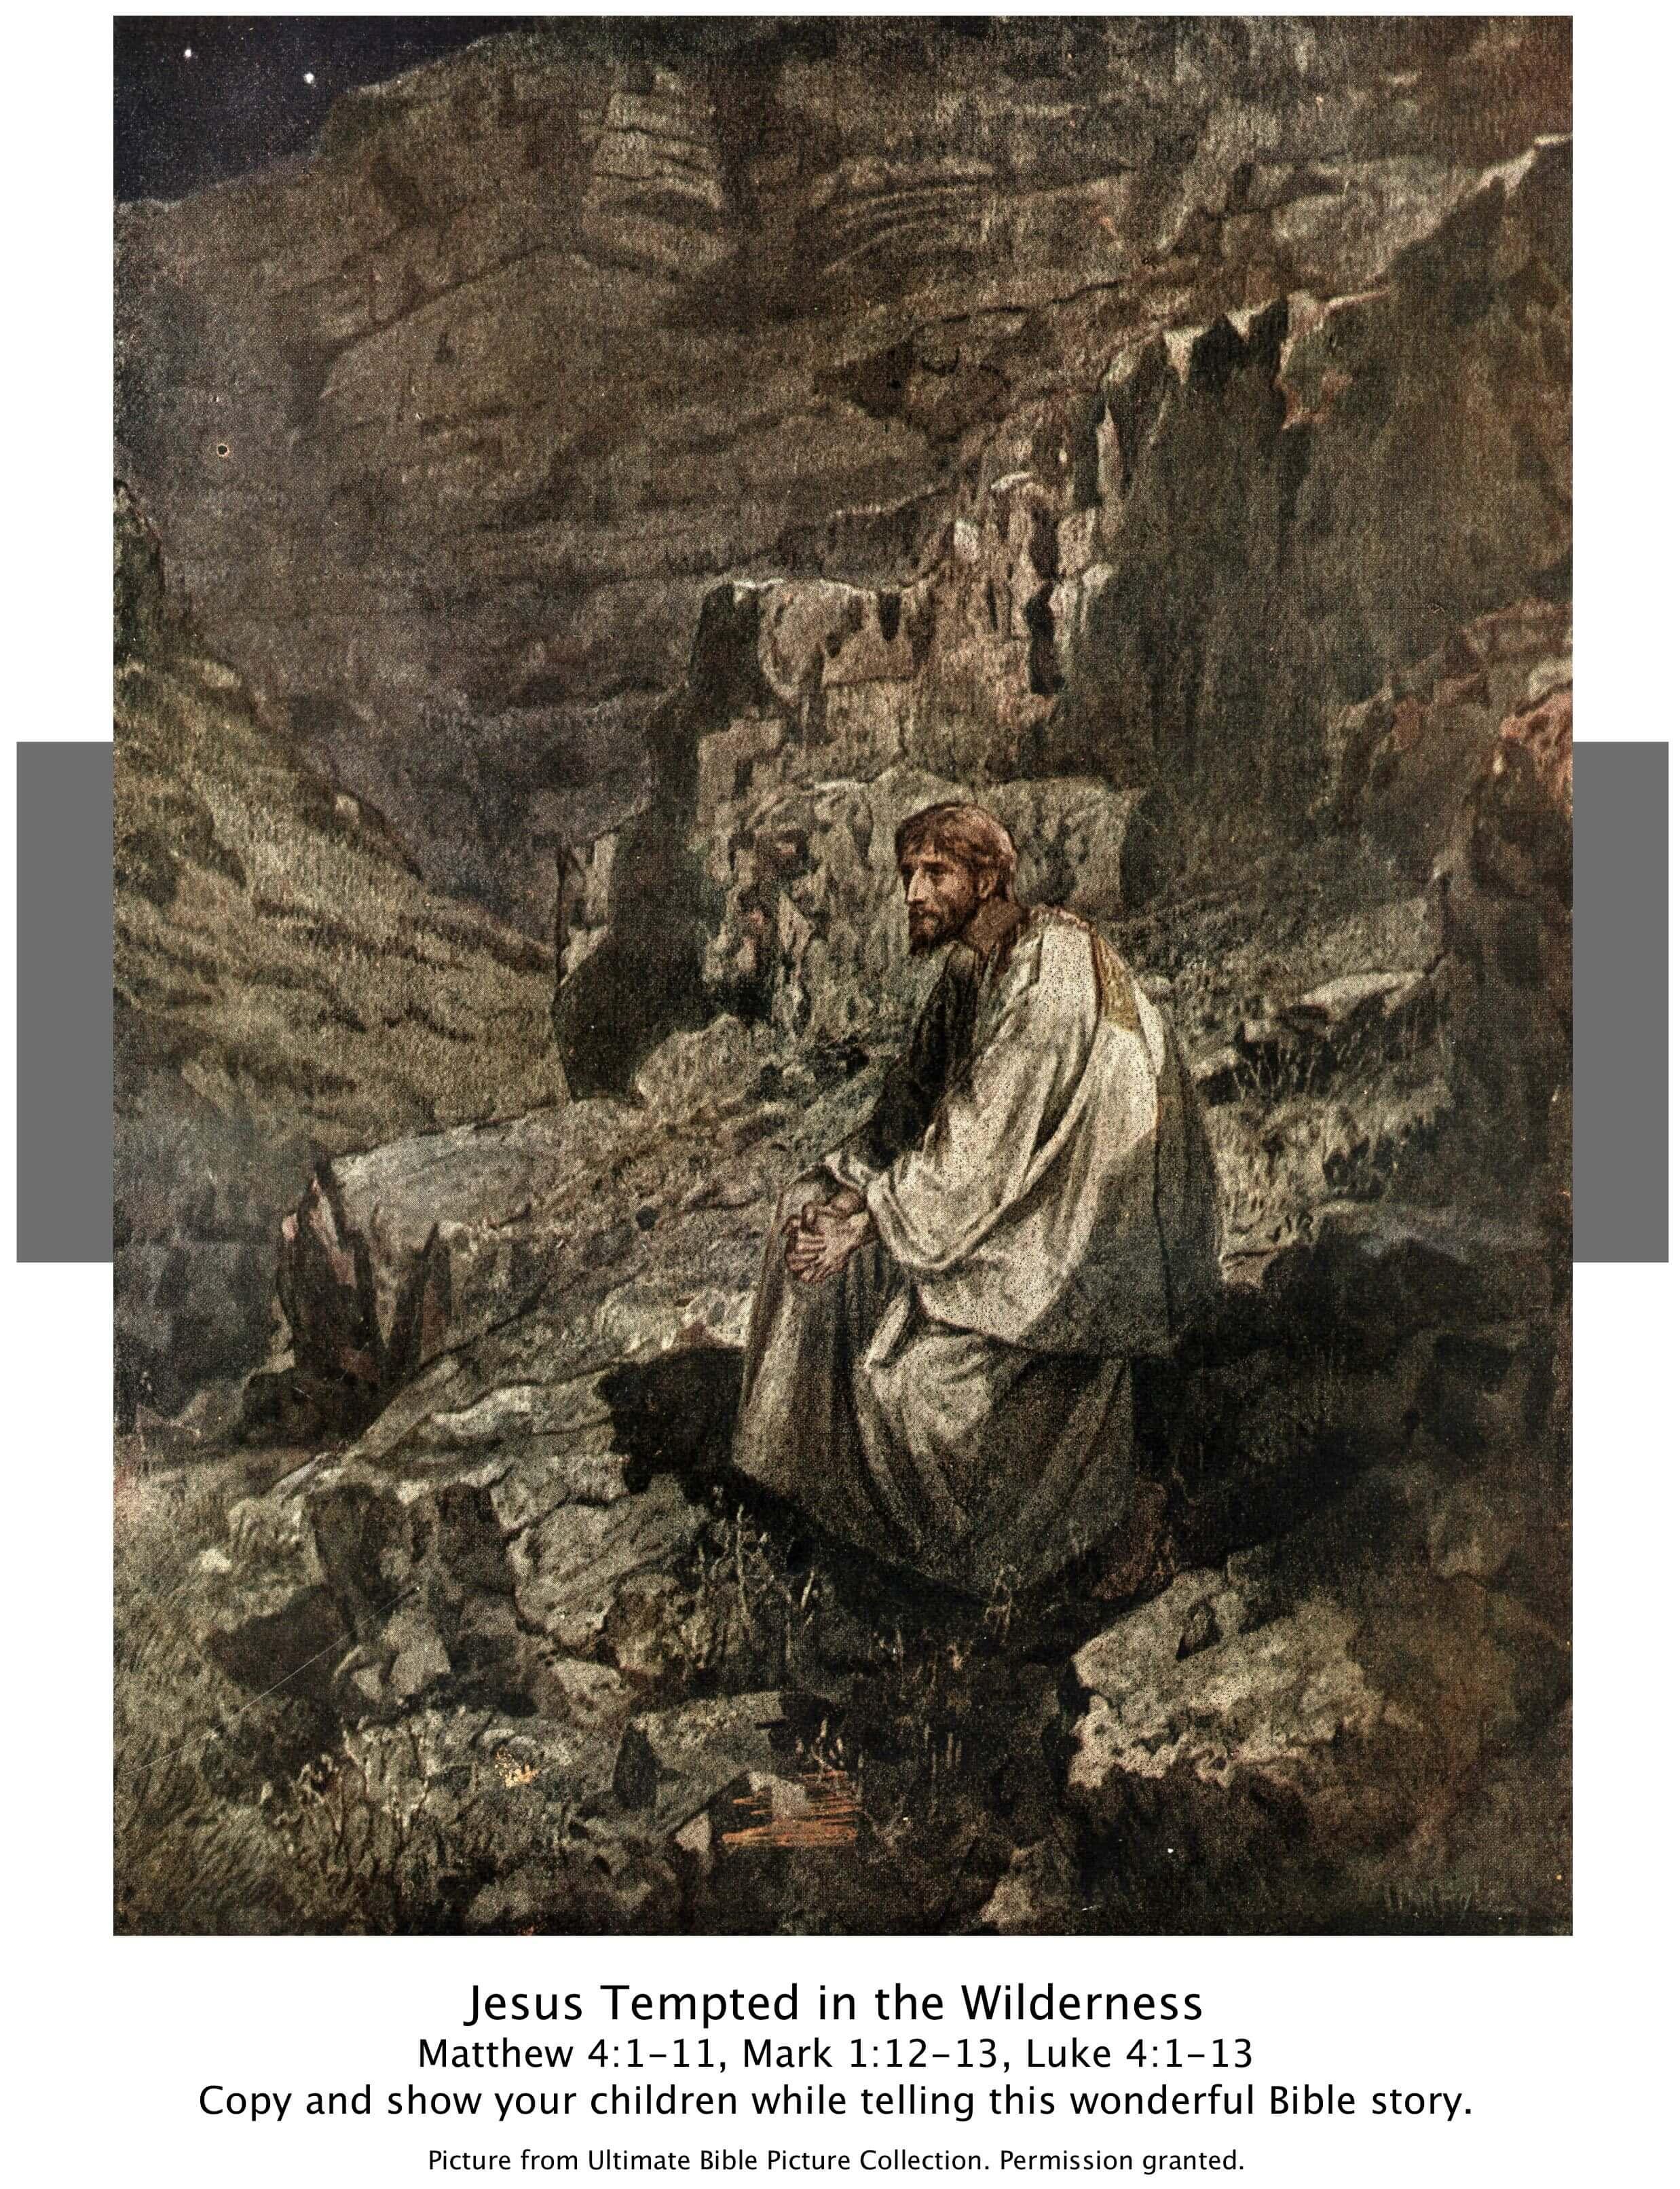 Bible Story PicturesJesus Temptation In The Wilderness